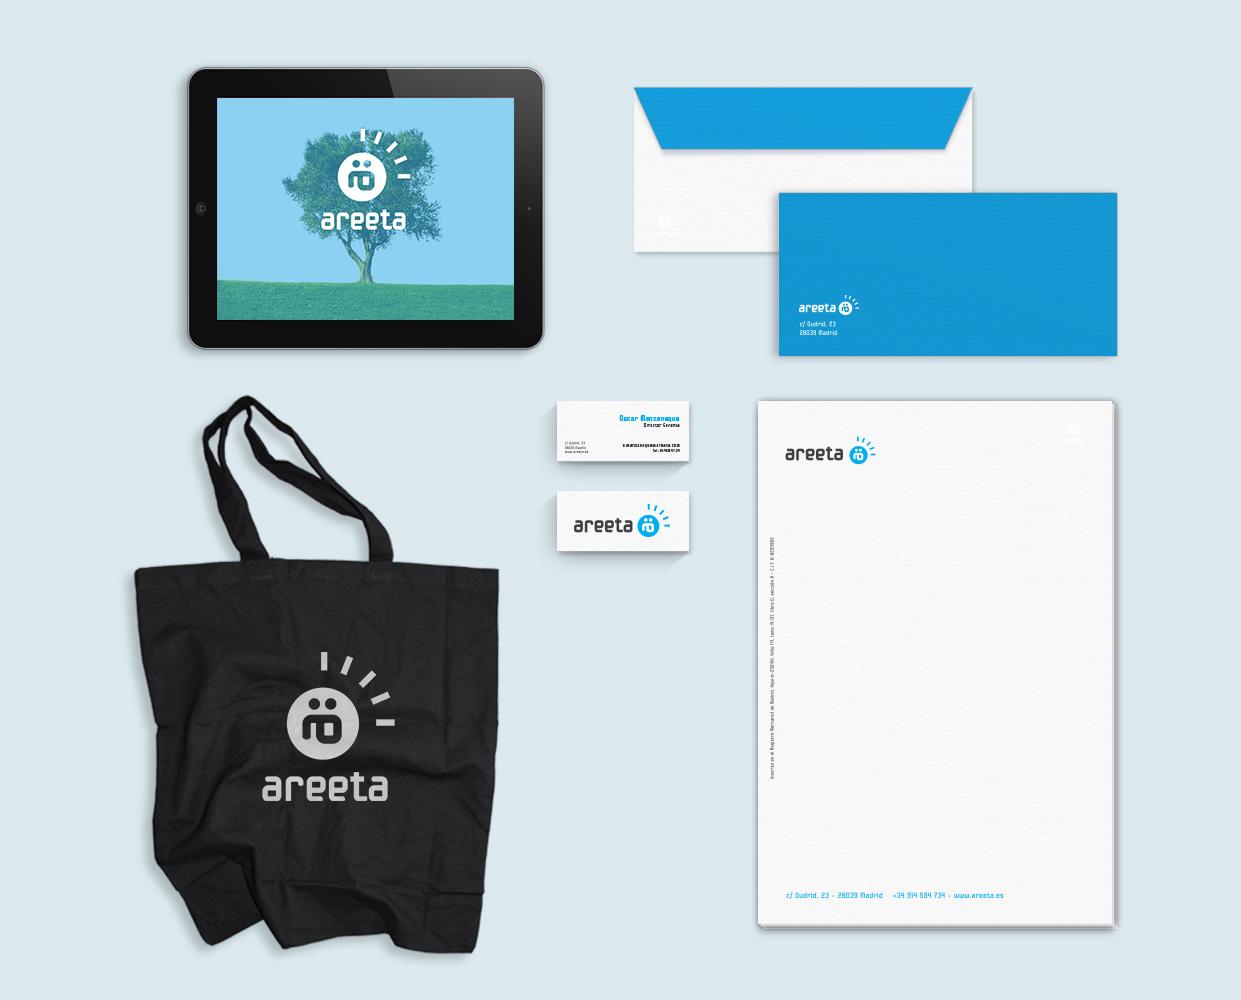 Logomarca_areeta_05.jpg